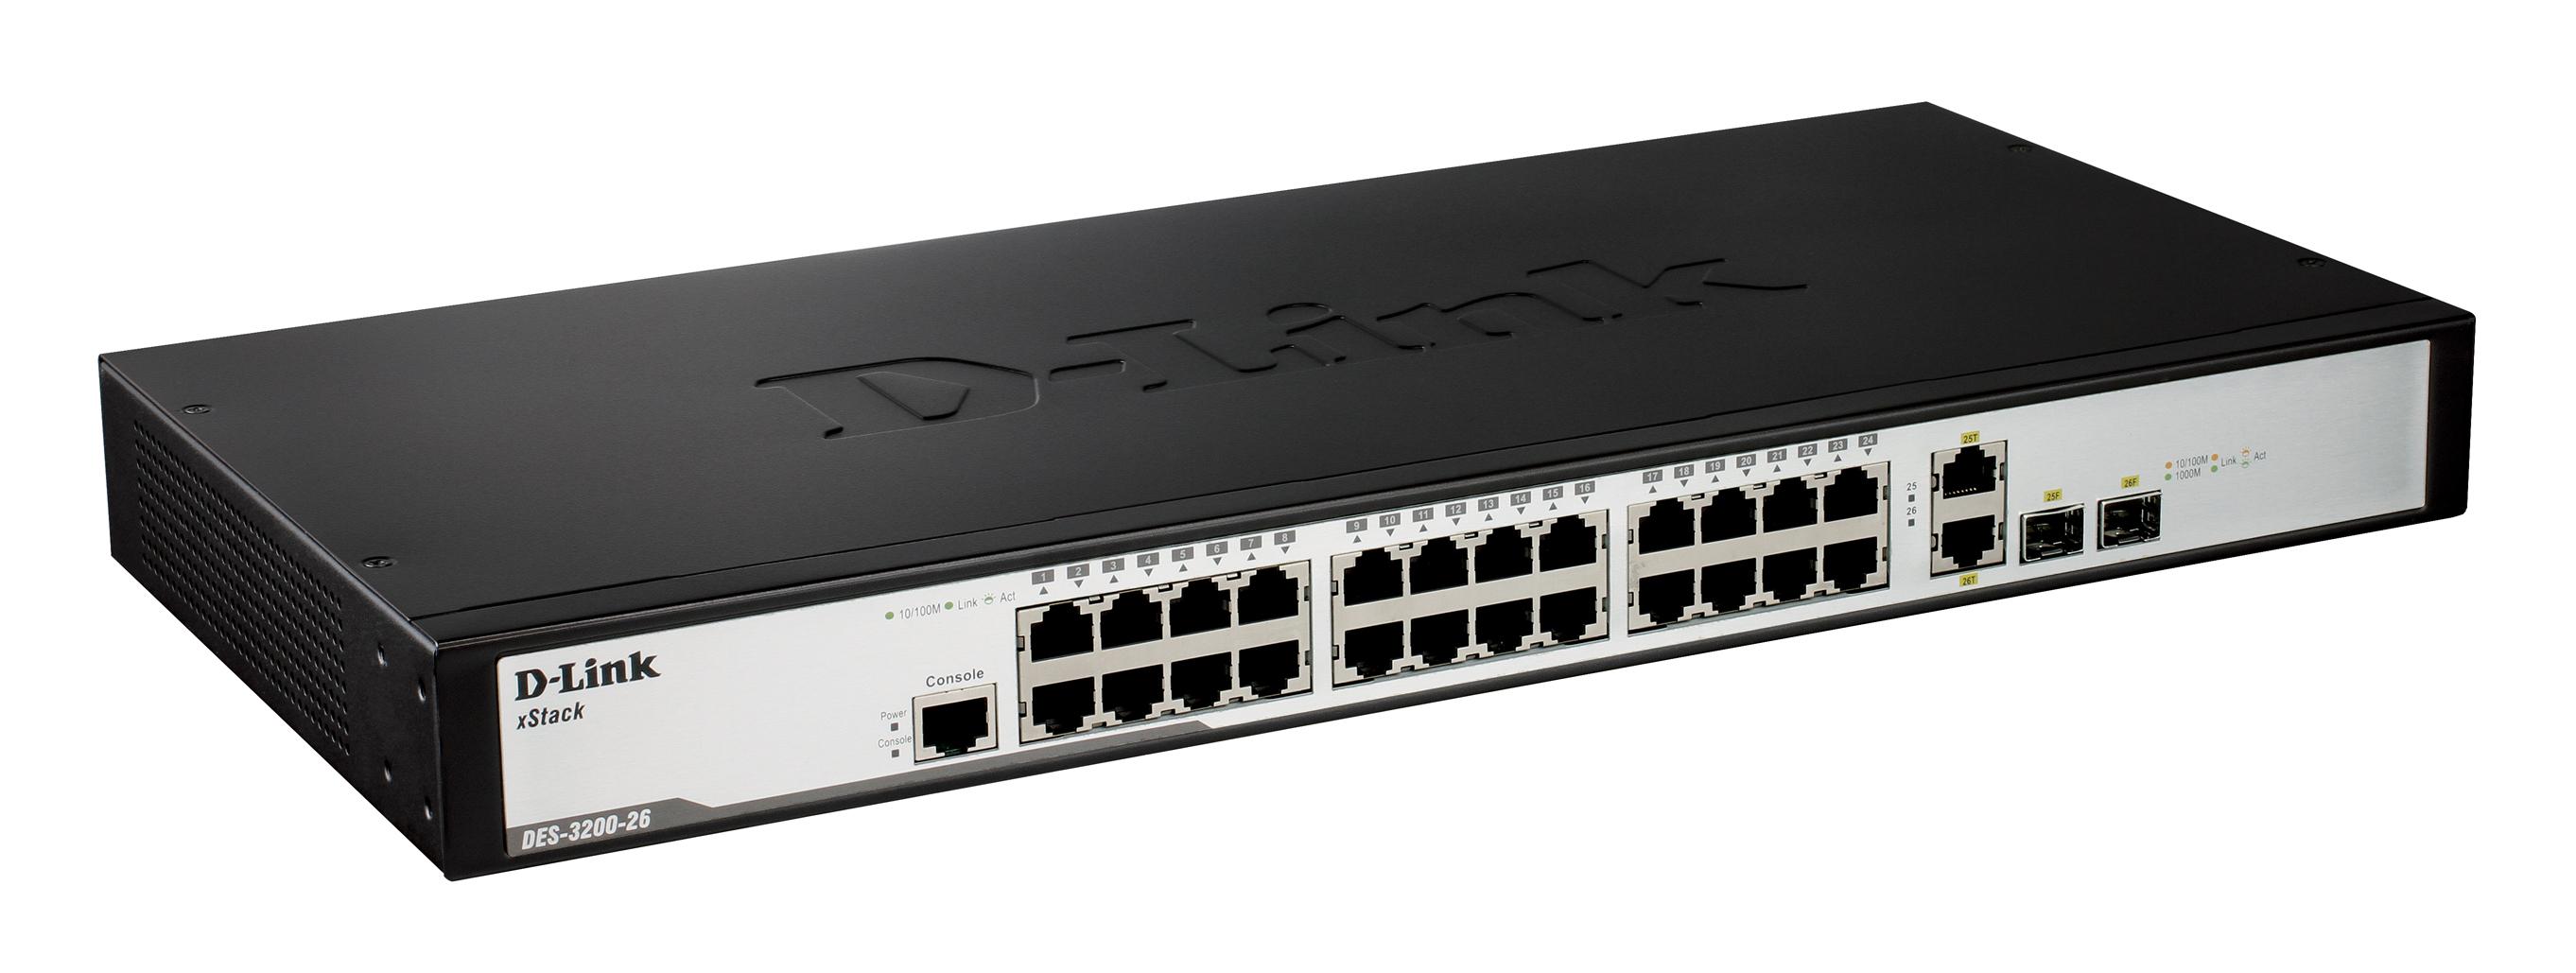 Xstack Managed 24port 10100 L2 Switch 4 Gigabit Copper Ports Edimax Es 1008p 8 Port Fast Ethernet Poe 24 10 100base T 2 Combo 1000base Sfp